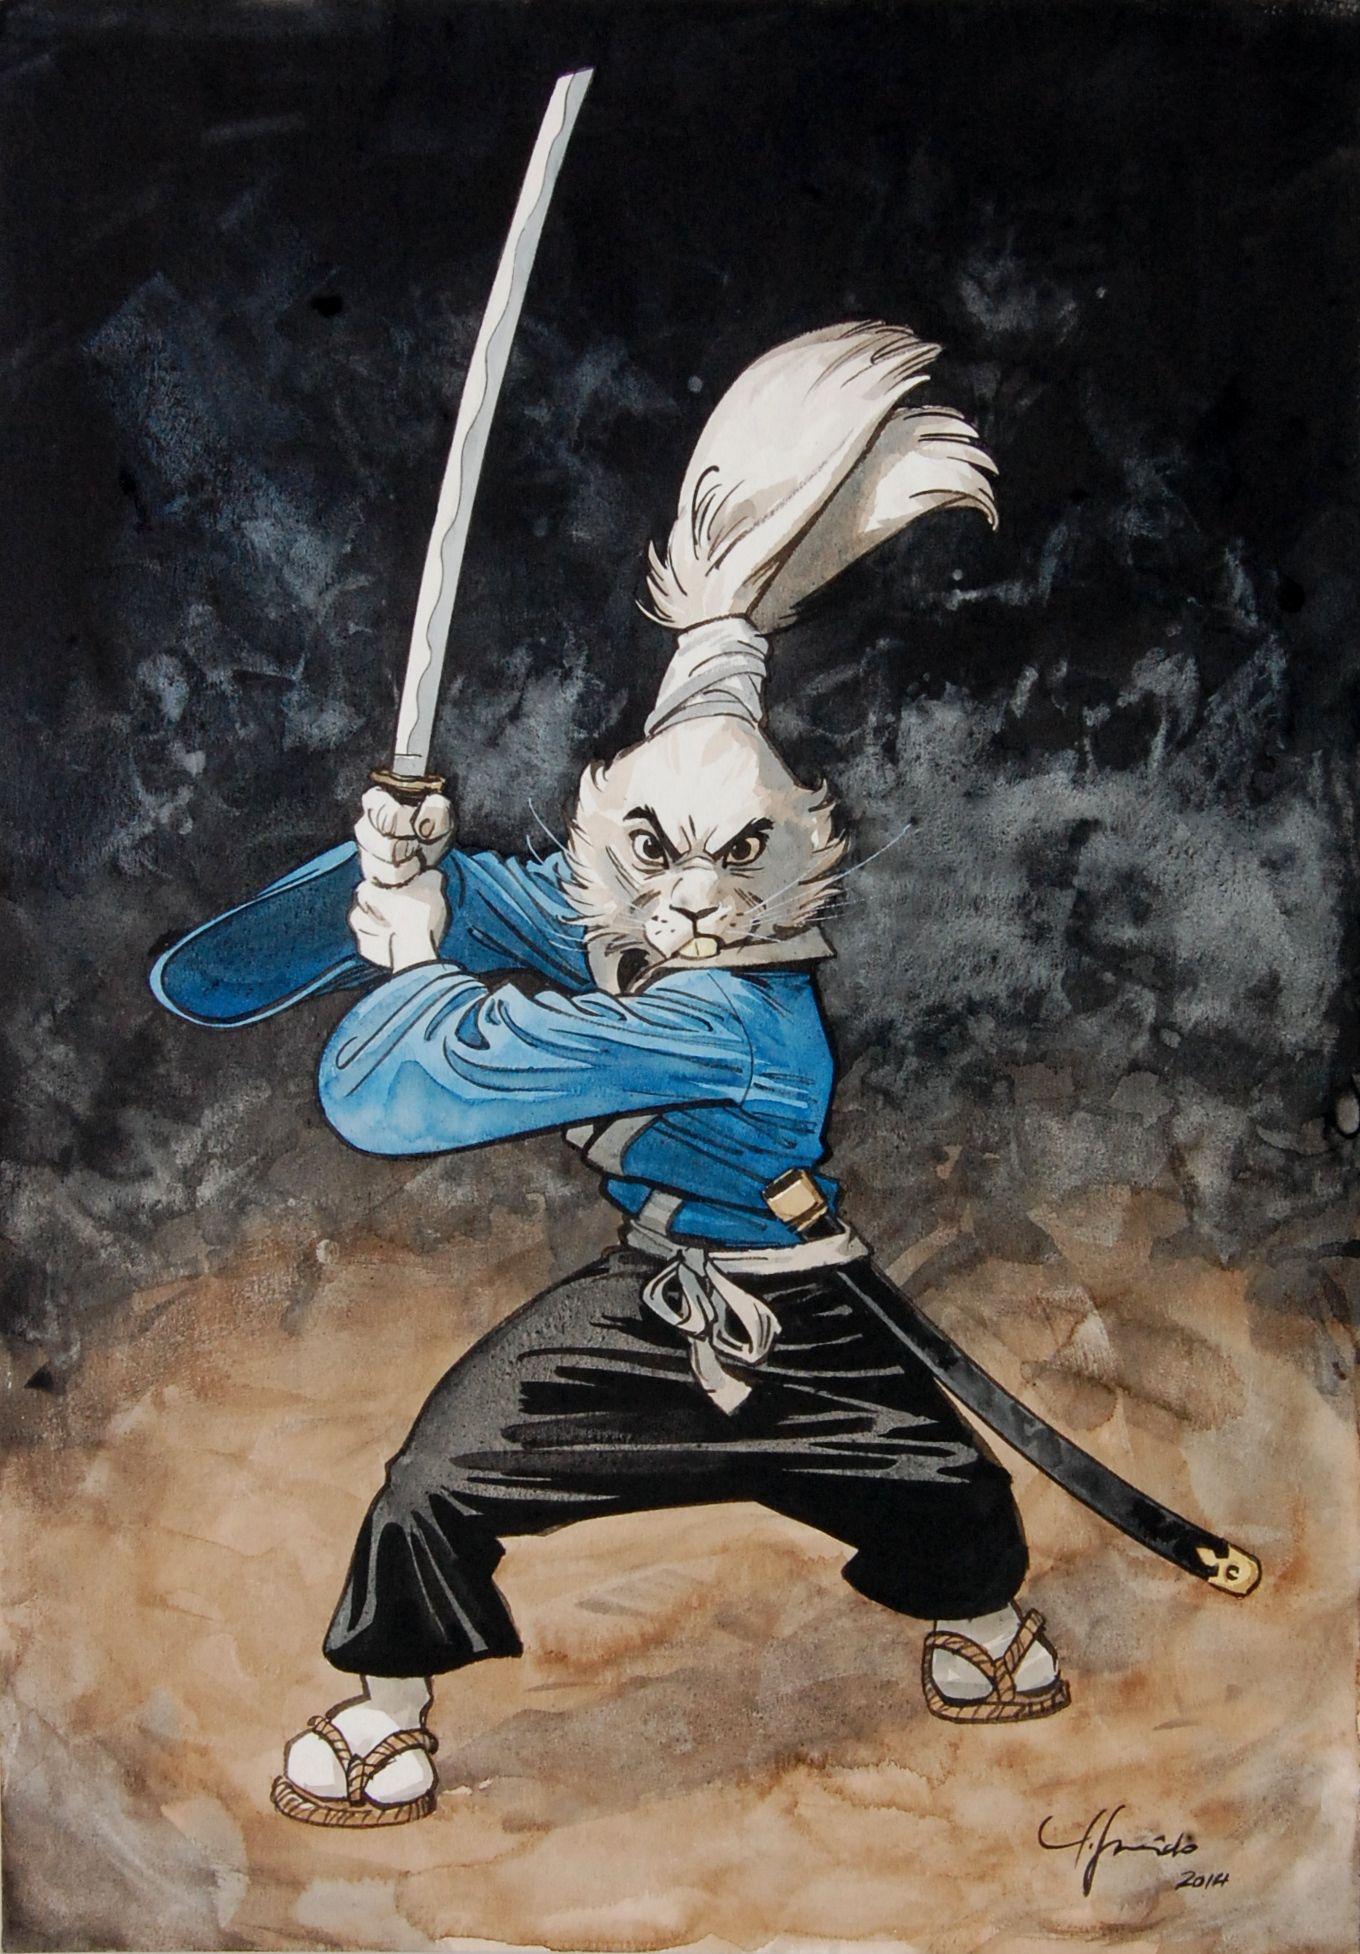 Juanjo Guarnido's Usagi Yojimbo tribute.